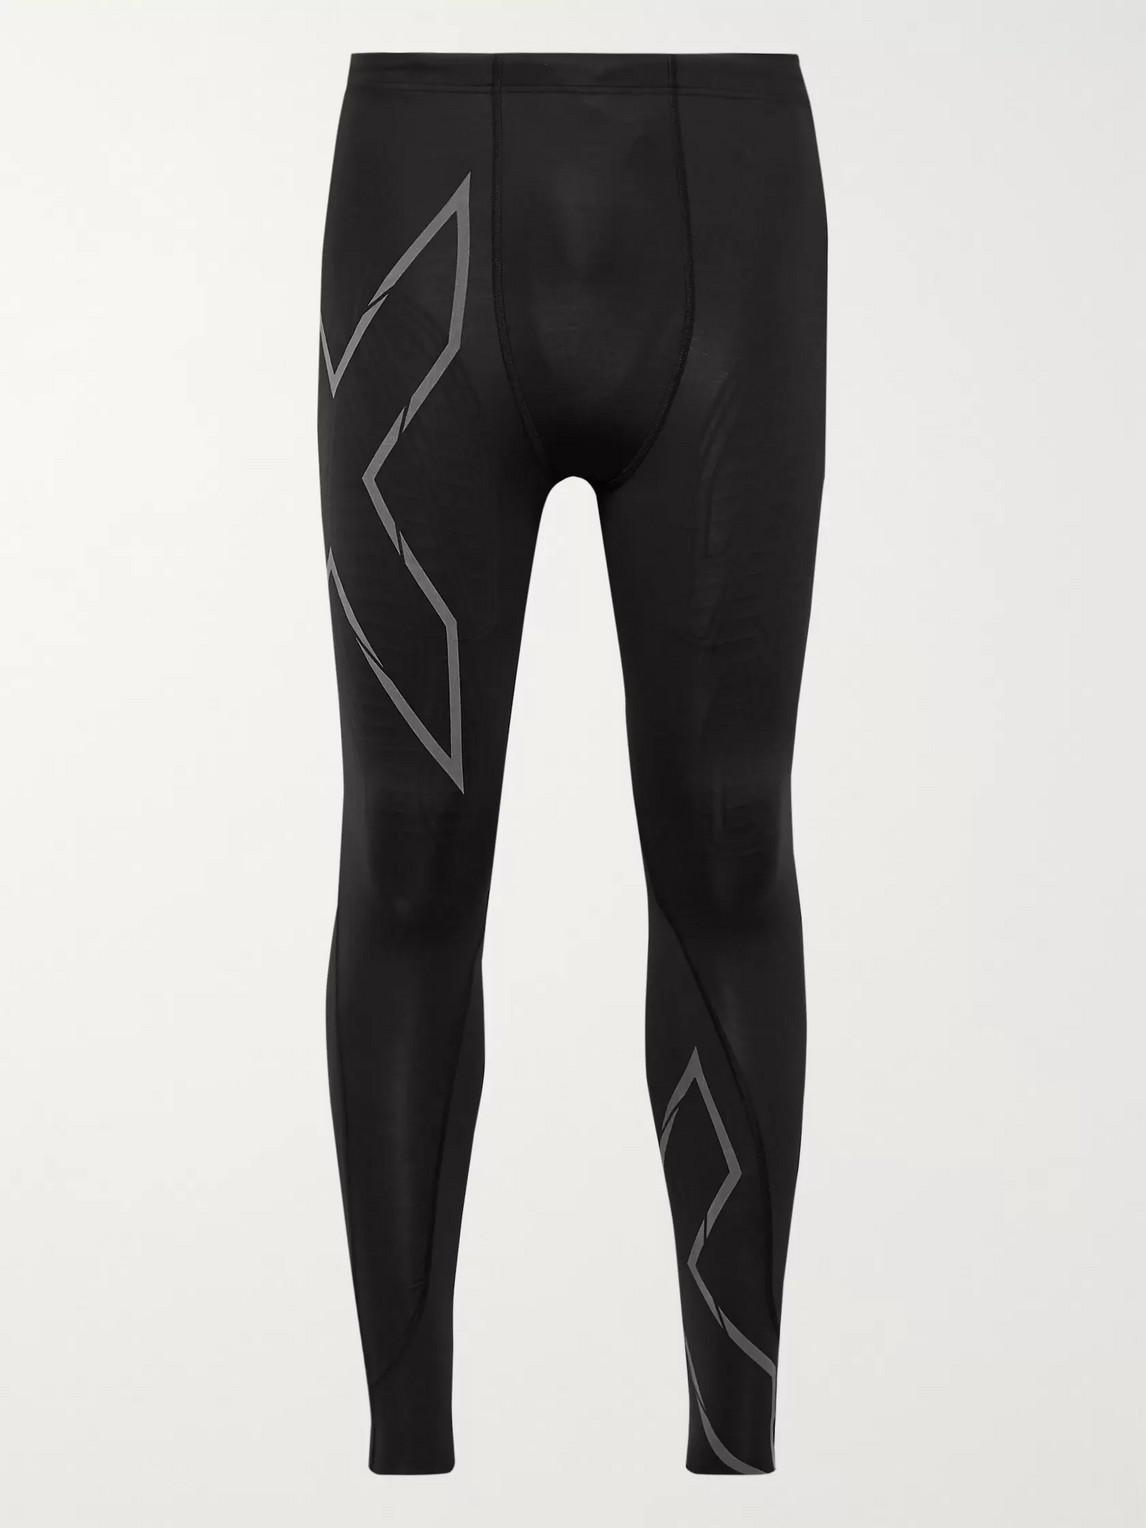 2xu - mcs run compression tights - men - black